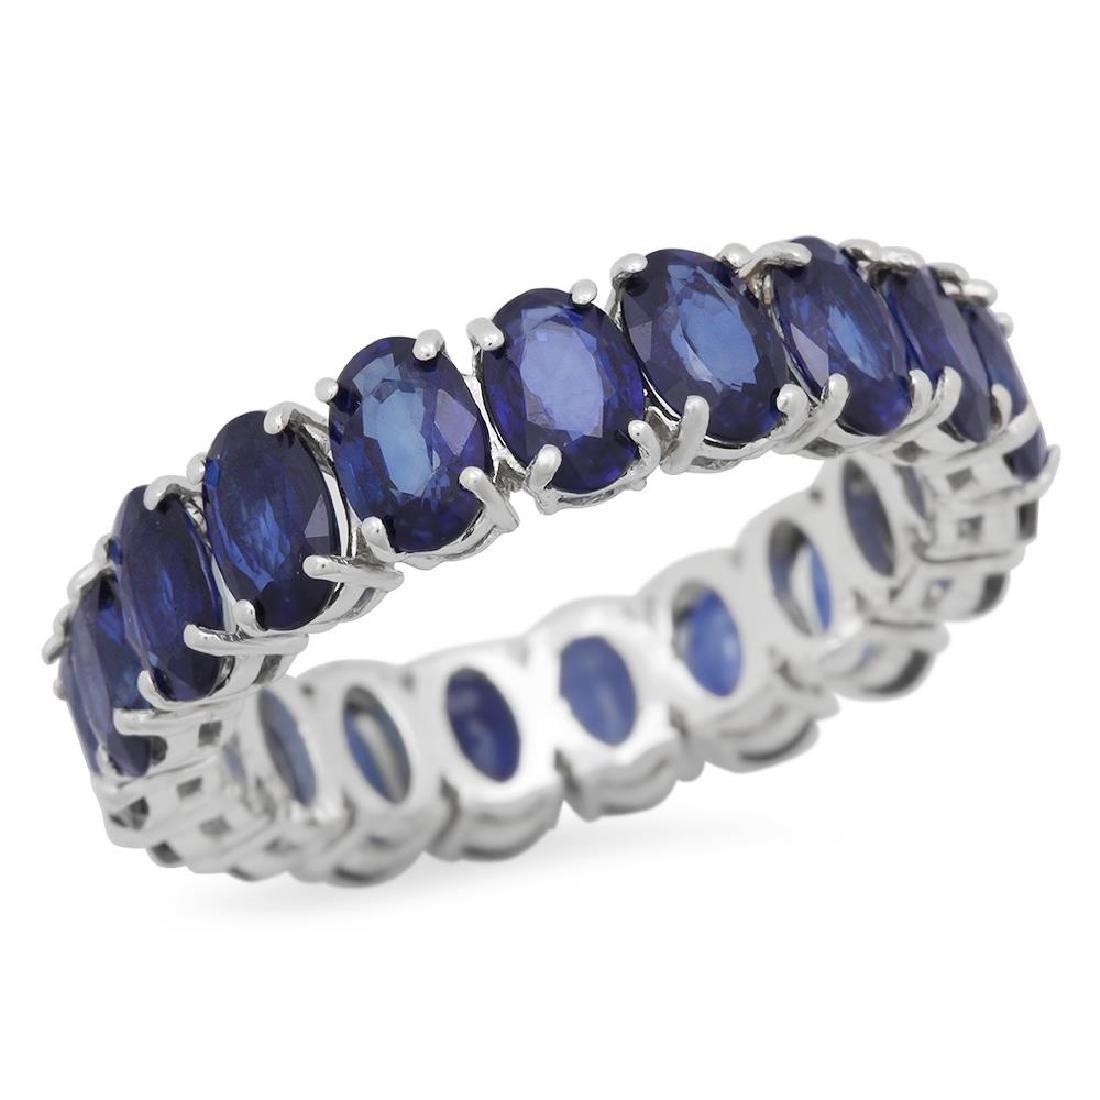 14K Gold 9.00ct Sapphire Ring